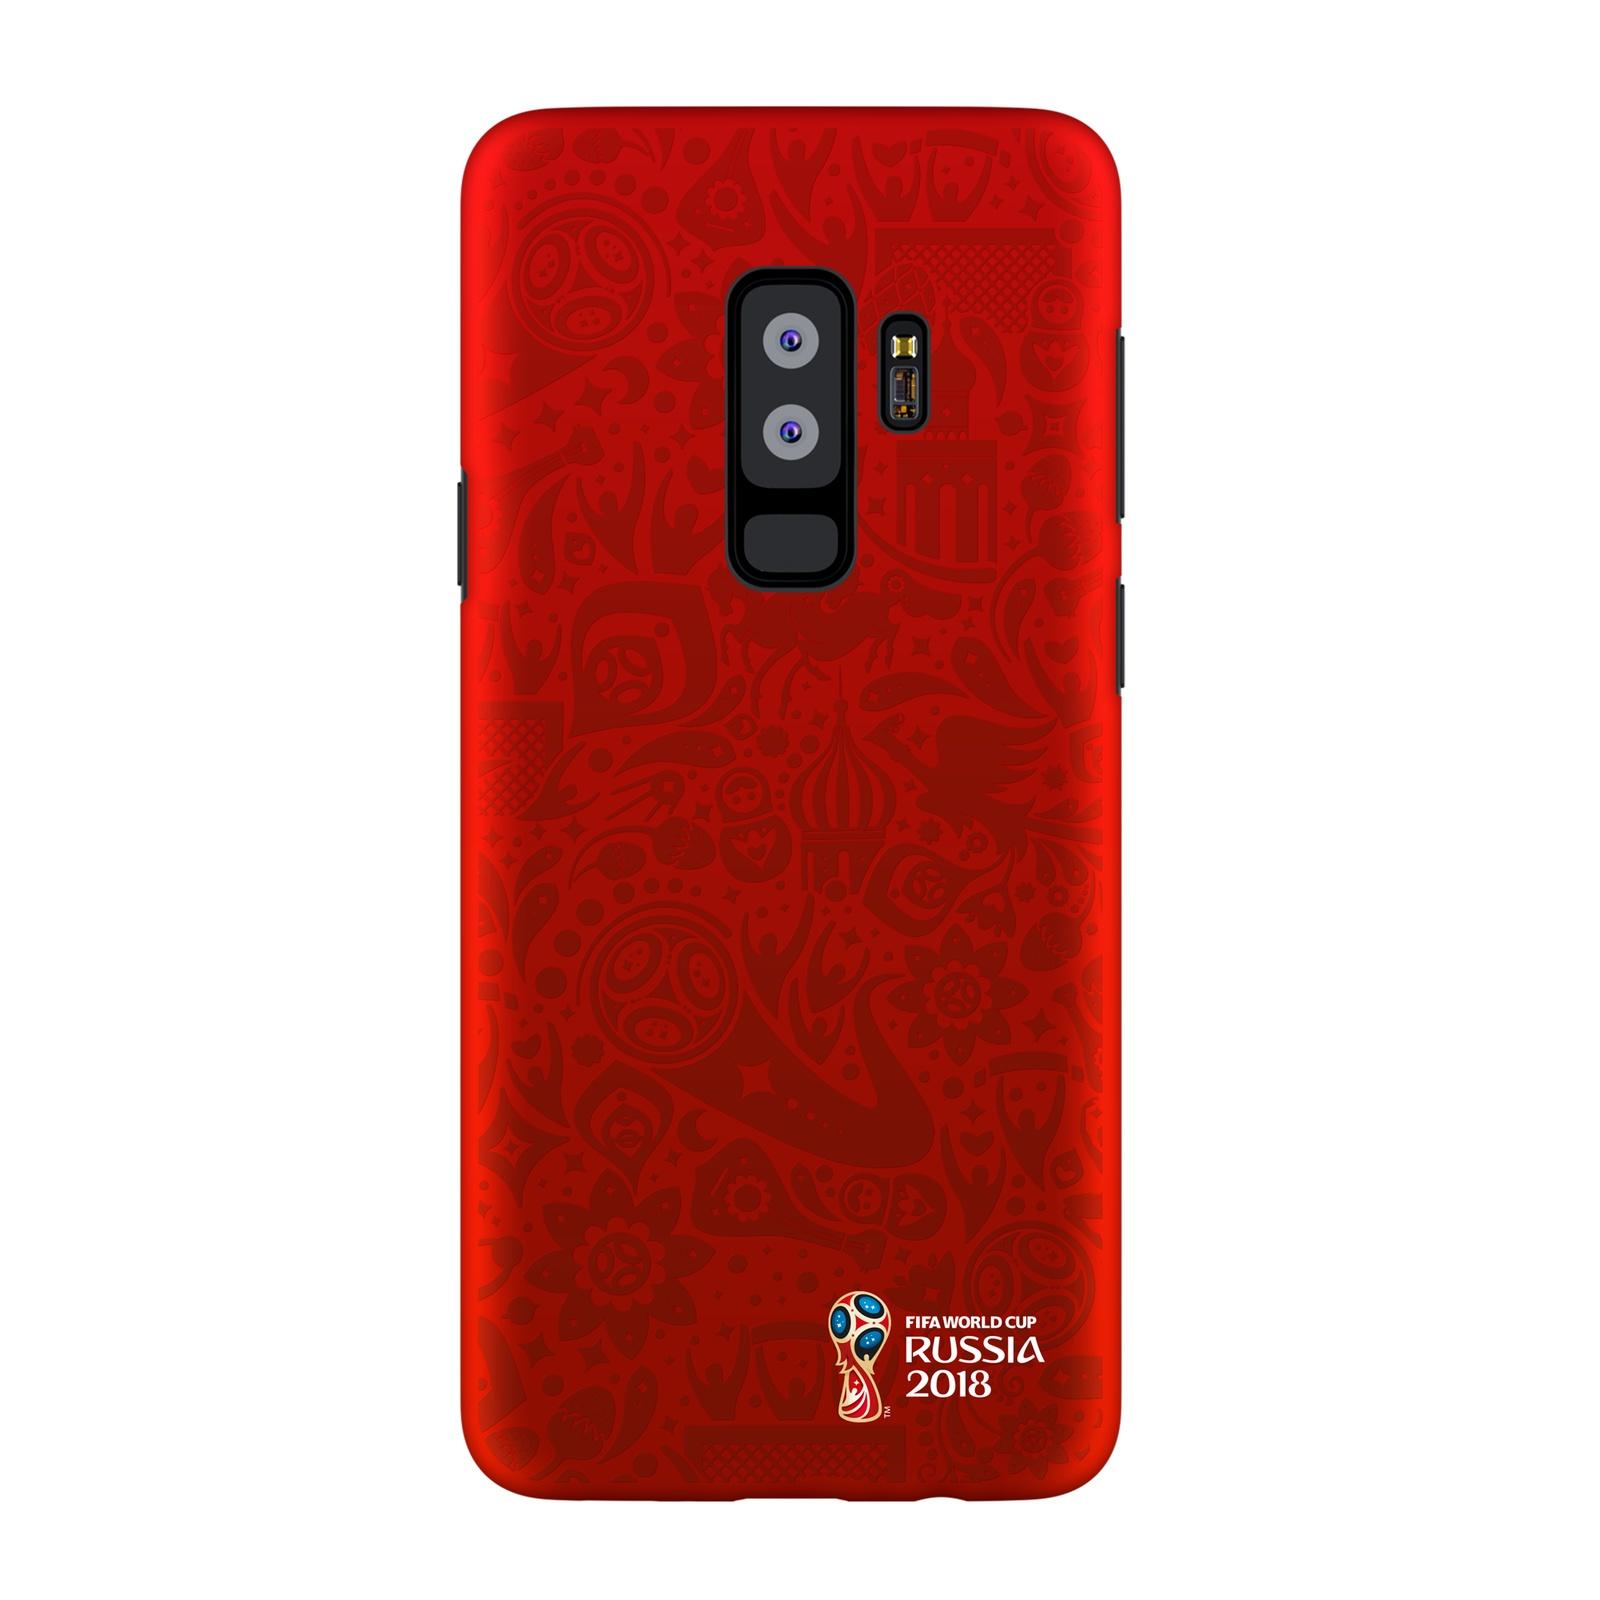 Чехол PC для Samsung Galaxy S9+, FIFA Official Pattern red, Deppa чехол fifa 2018 official pattern red для iphone 5 5s se